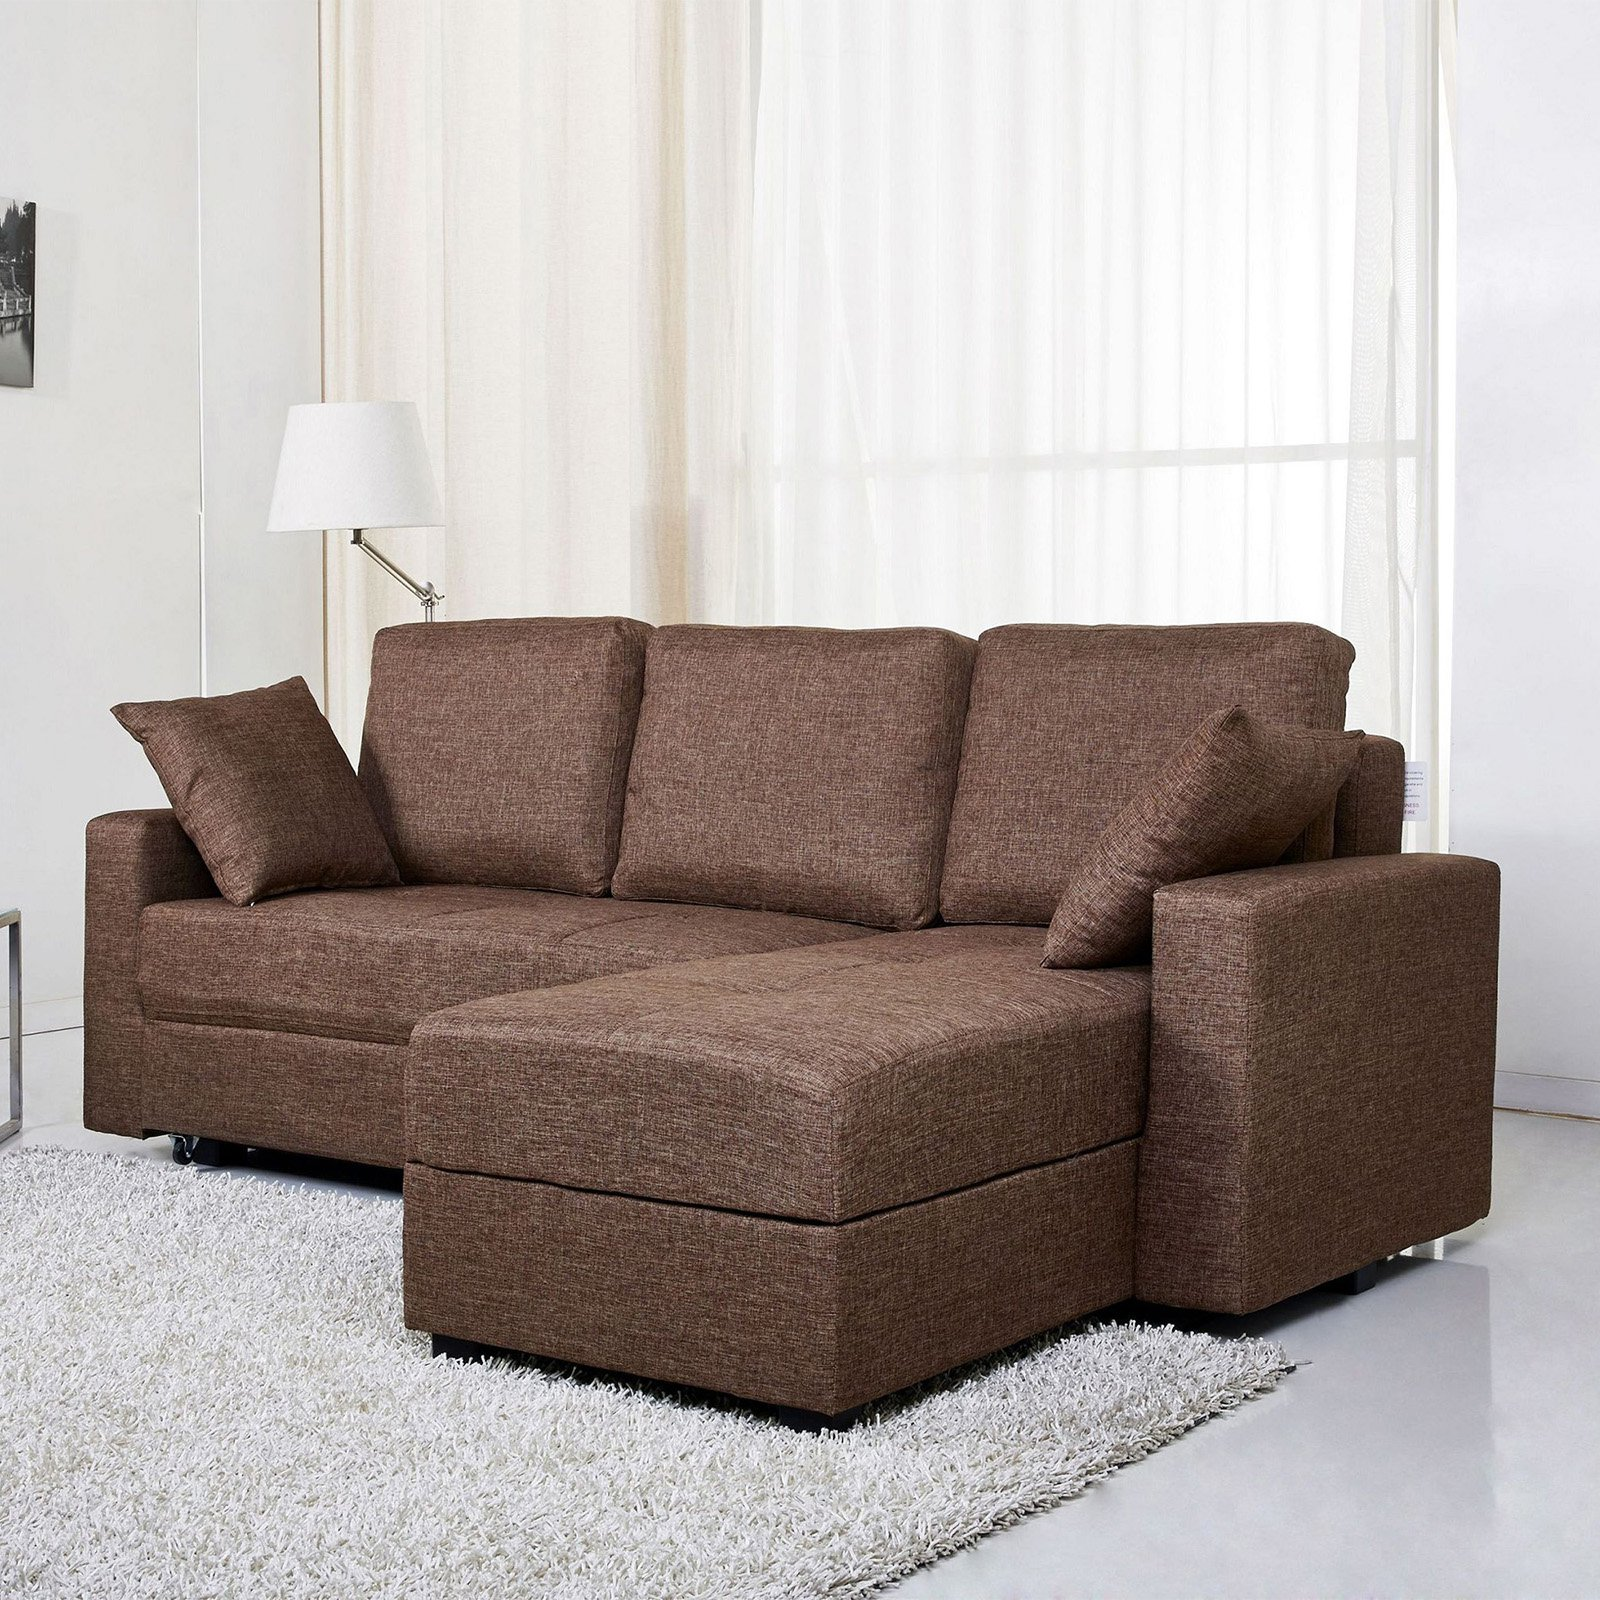 Gold Sparrow Aspen Fabric Convertible Storage Sectional Sofa